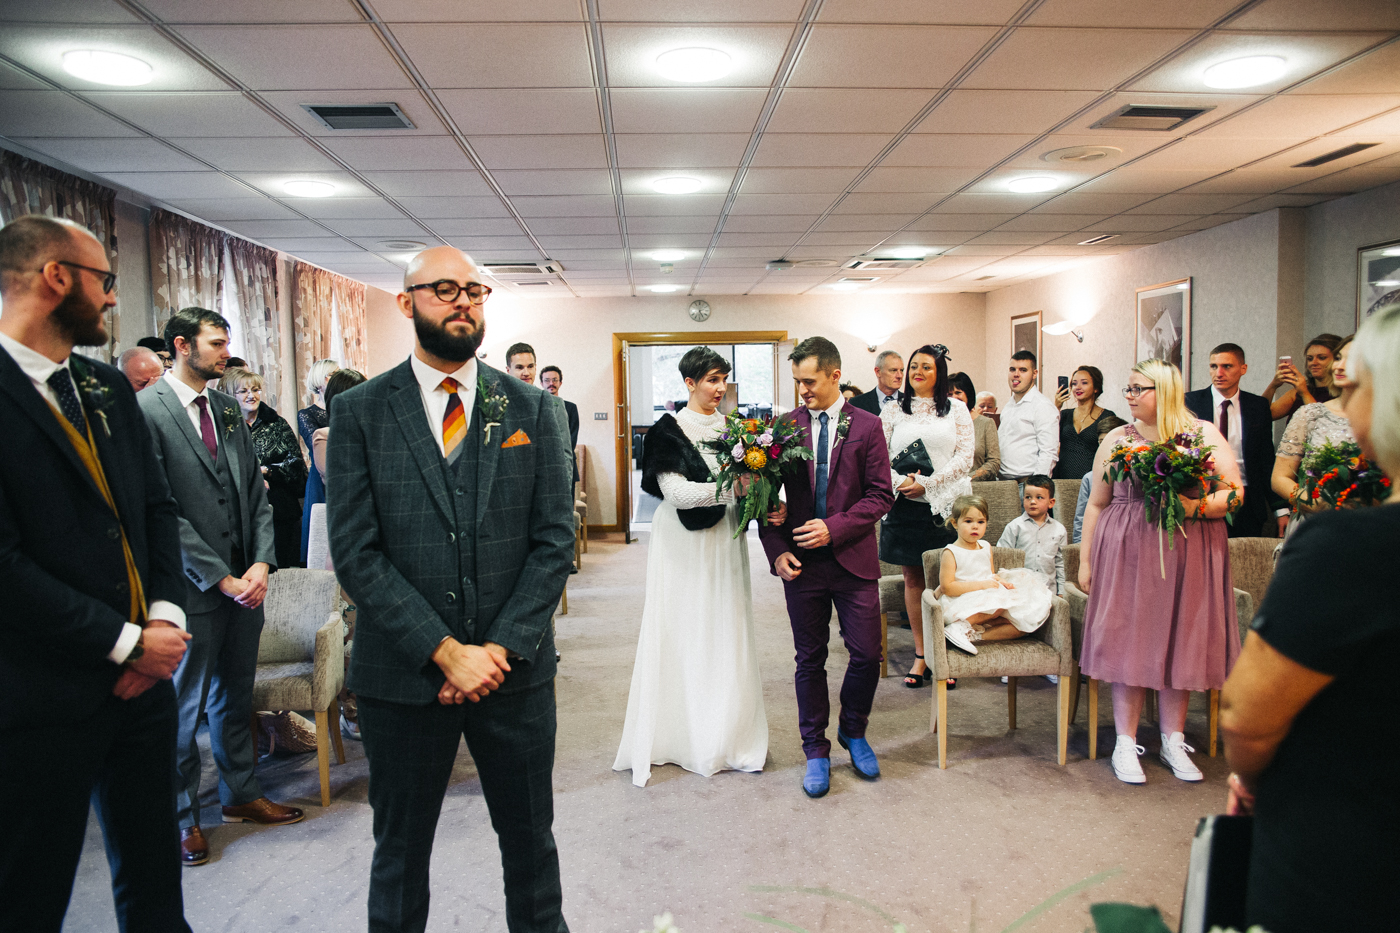 teesside-newcastle-gateshead-wedding-photography-photographer-creative-0034.jpg